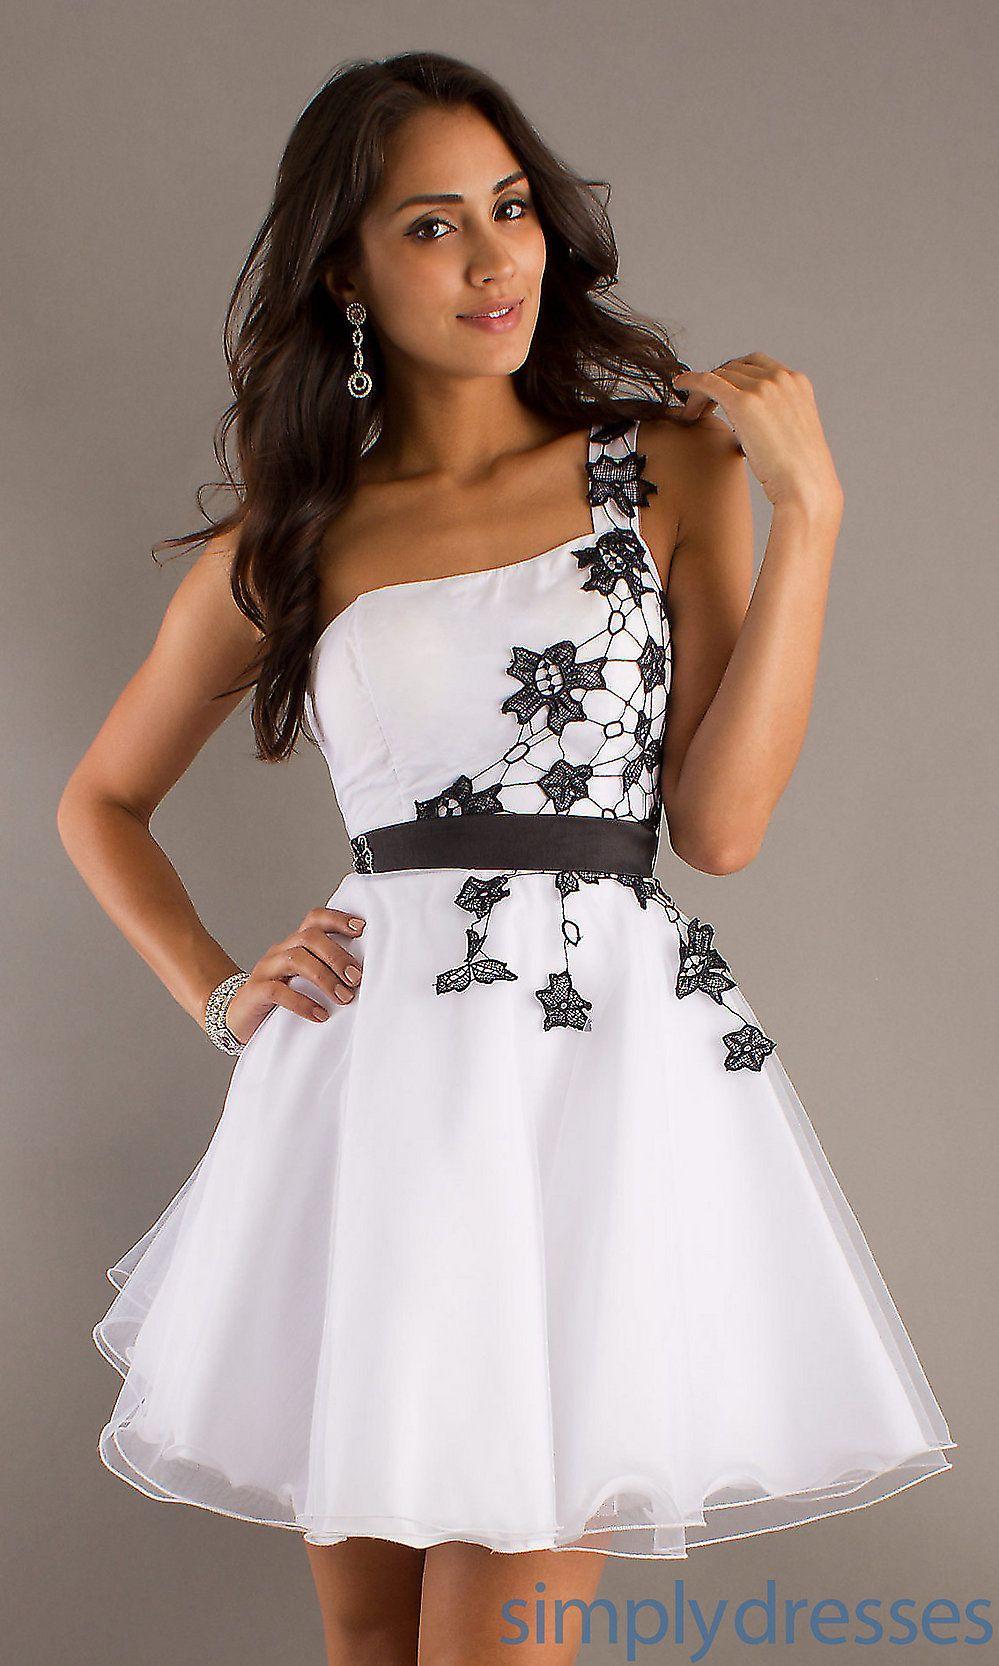 Collection Cute White Party Dresses Pictures - Klarosa